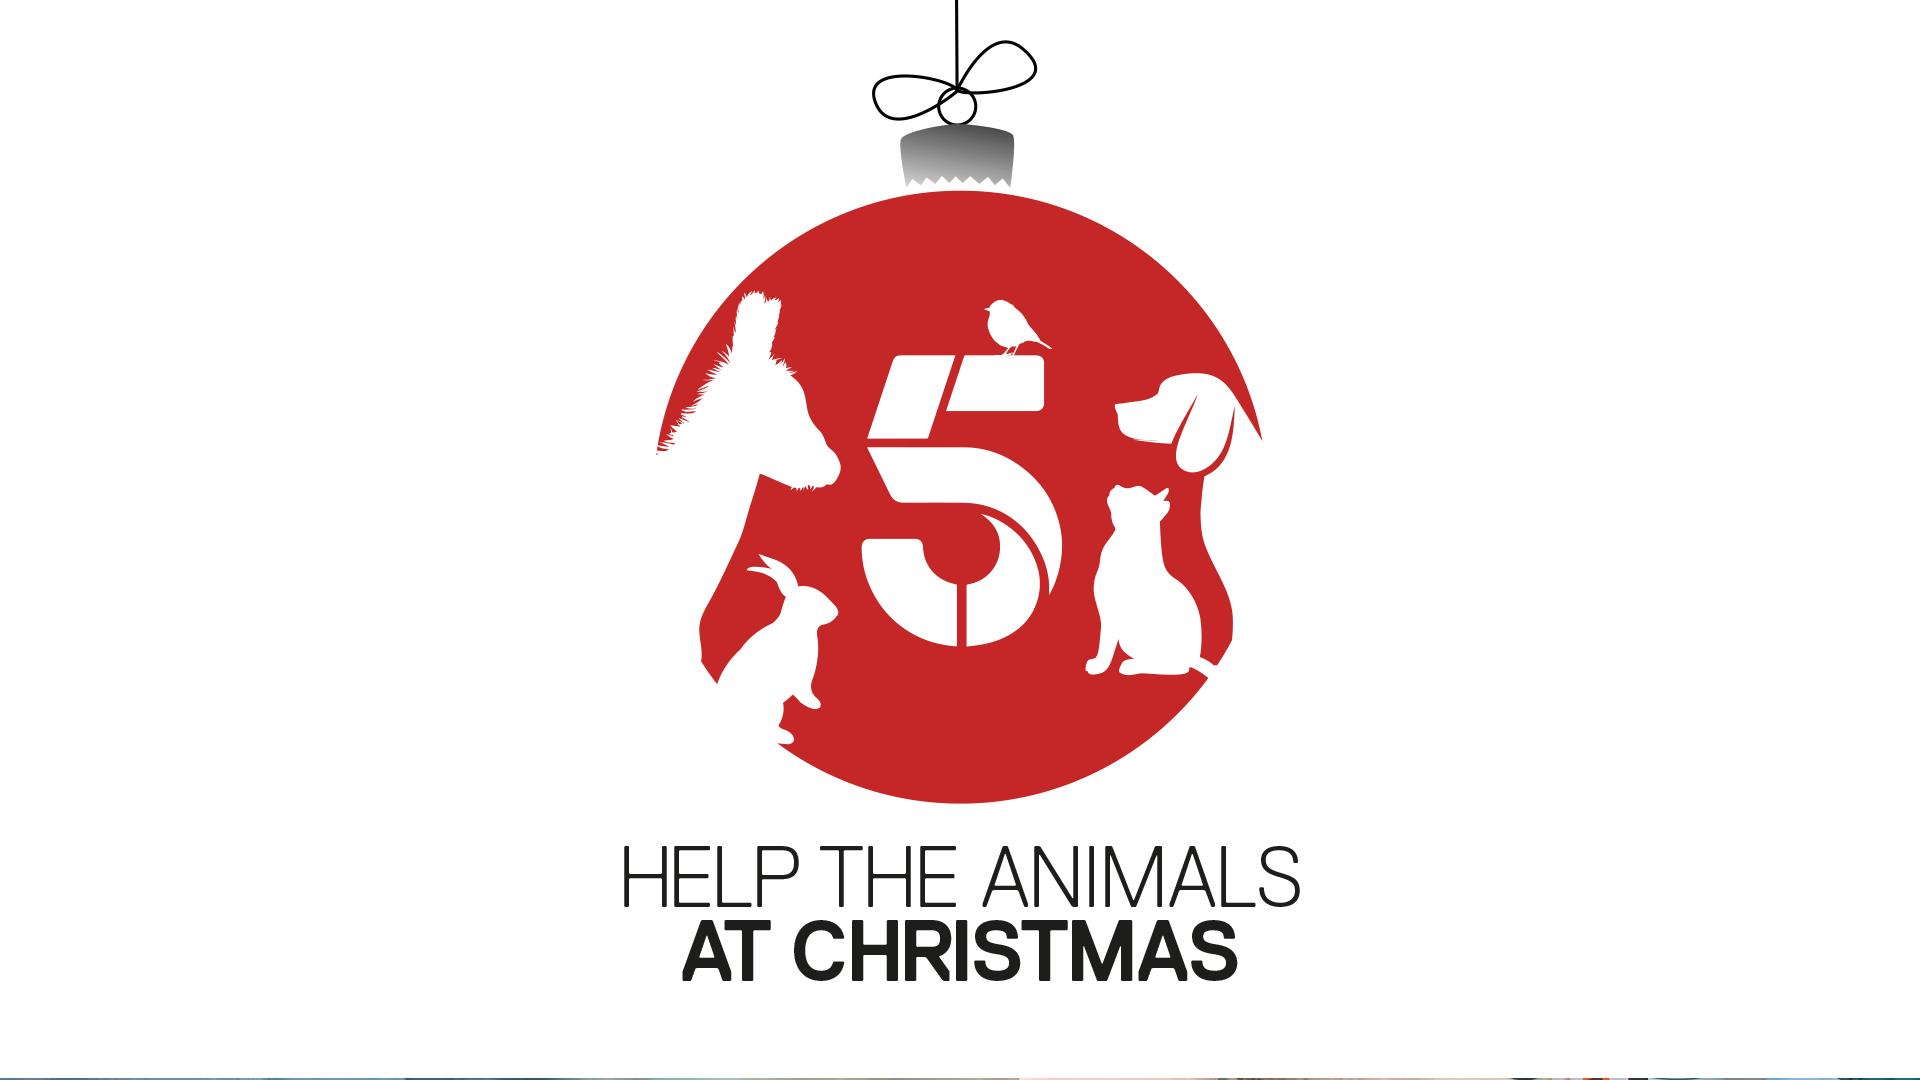 help the animals at christmas.jpg